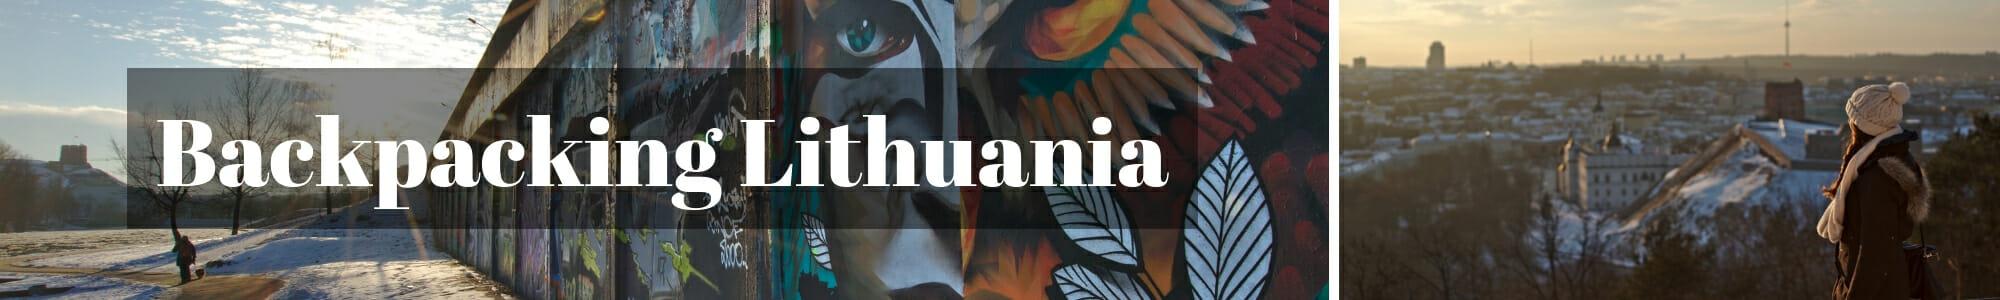 backpacking lithuania